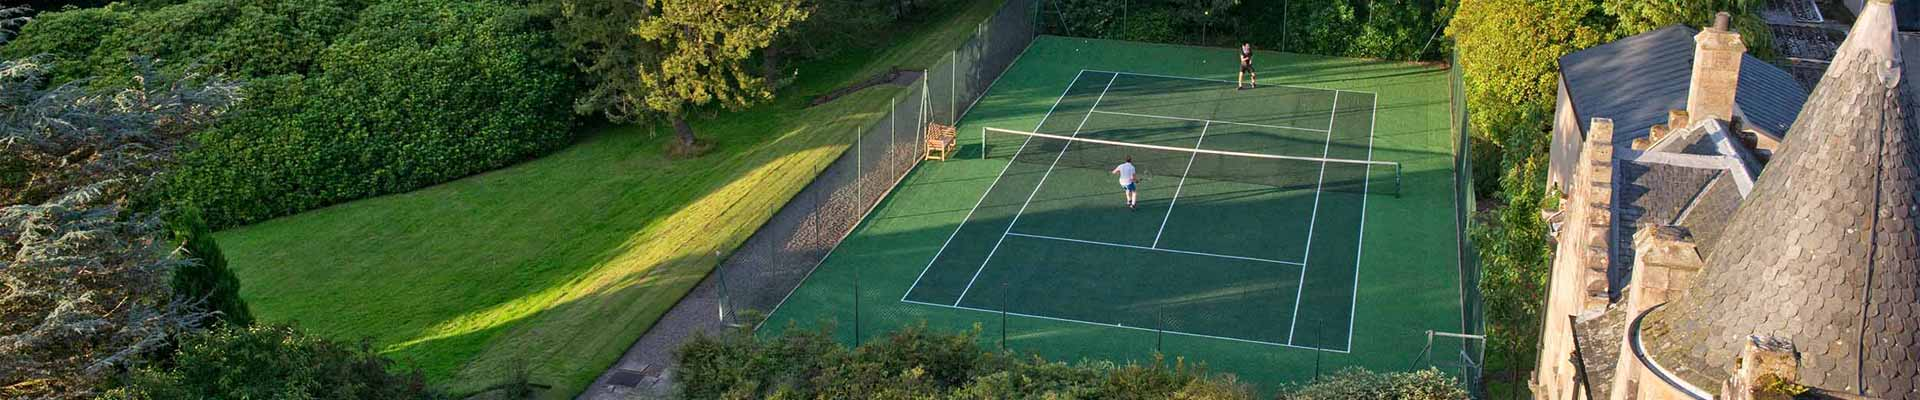 Photo of Glenapp Castle's tennis court